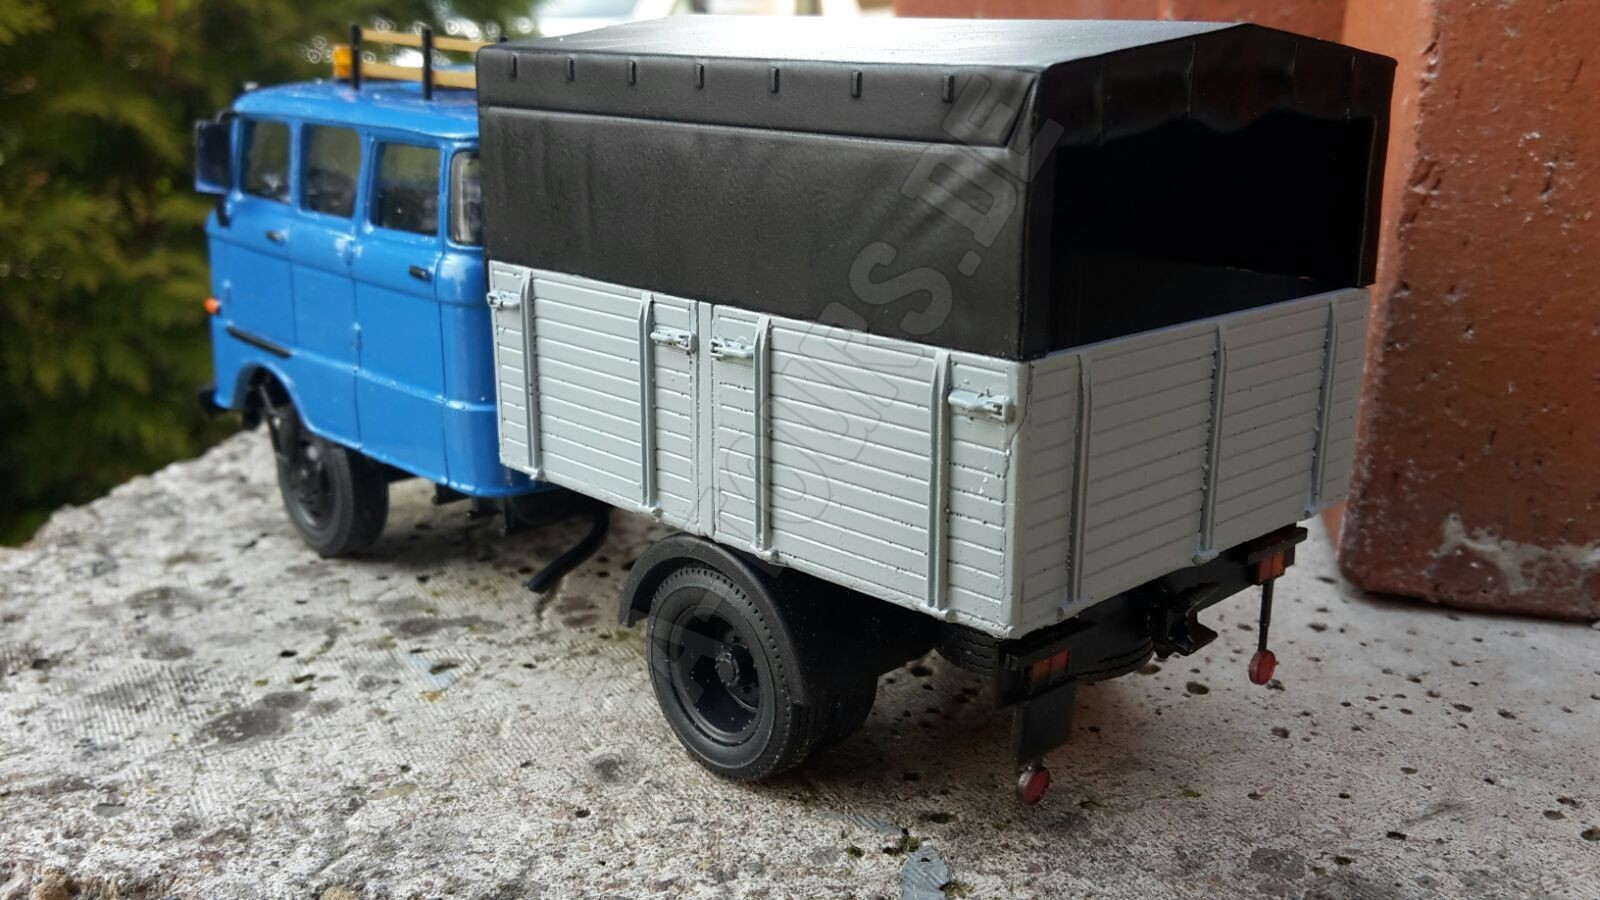 ifa lkw w50 al modell in 1 43 ifa tours. Black Bedroom Furniture Sets. Home Design Ideas